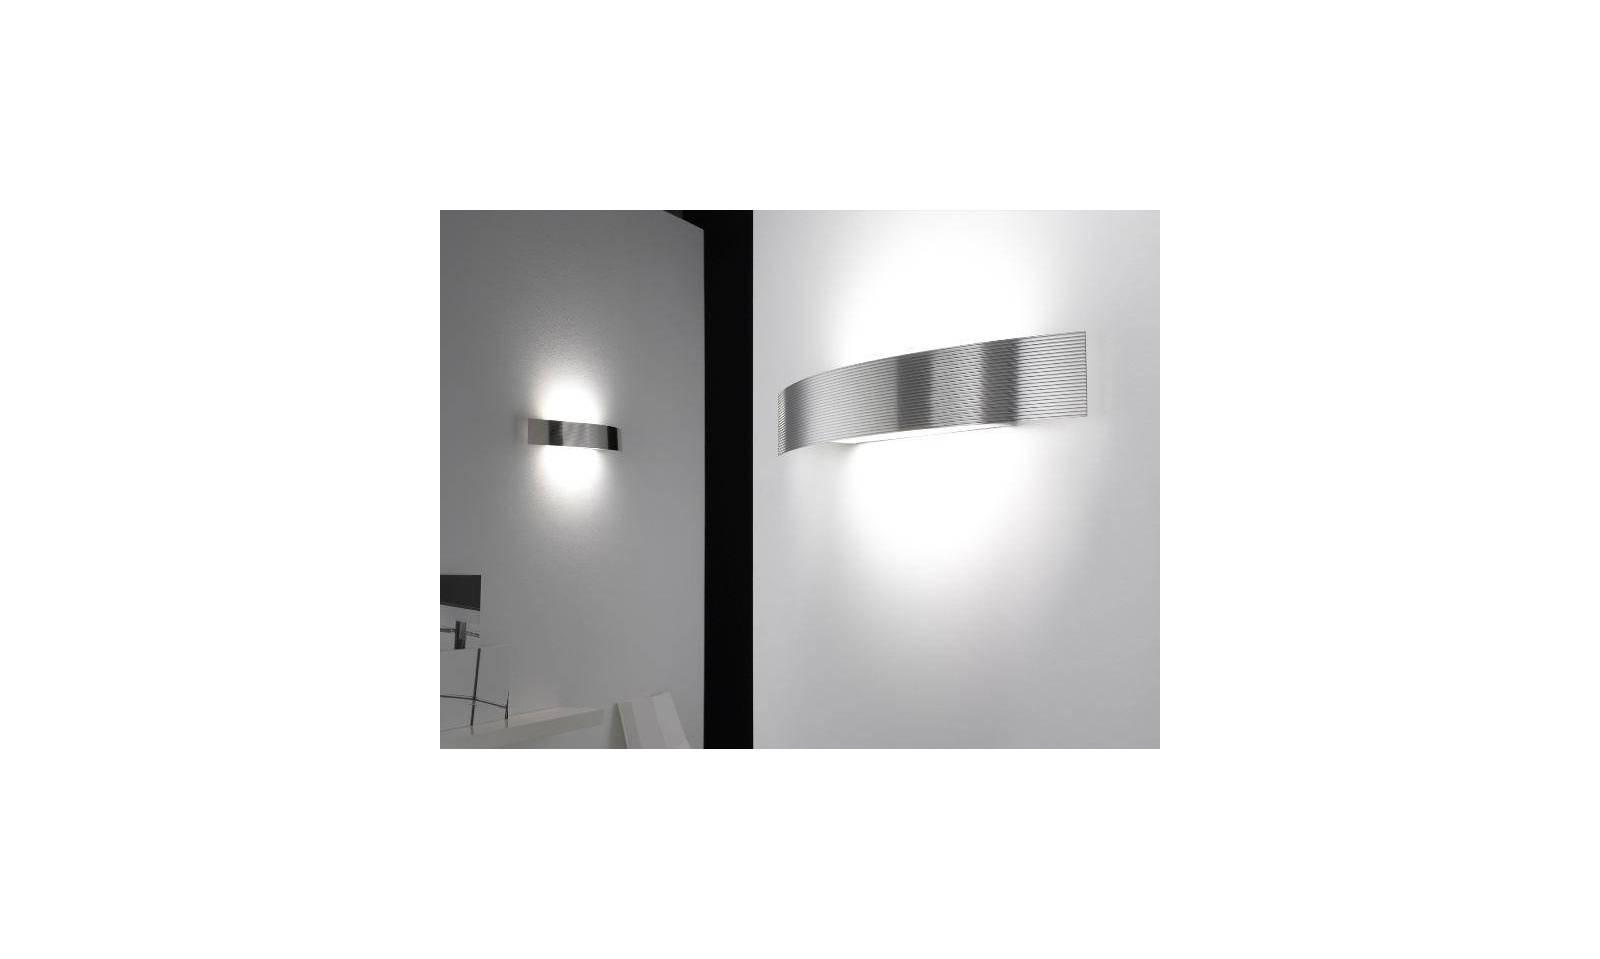 Plafoniere Da Parete Alternative : Selene illuminazione lampada da parete serie bridge in acciaio